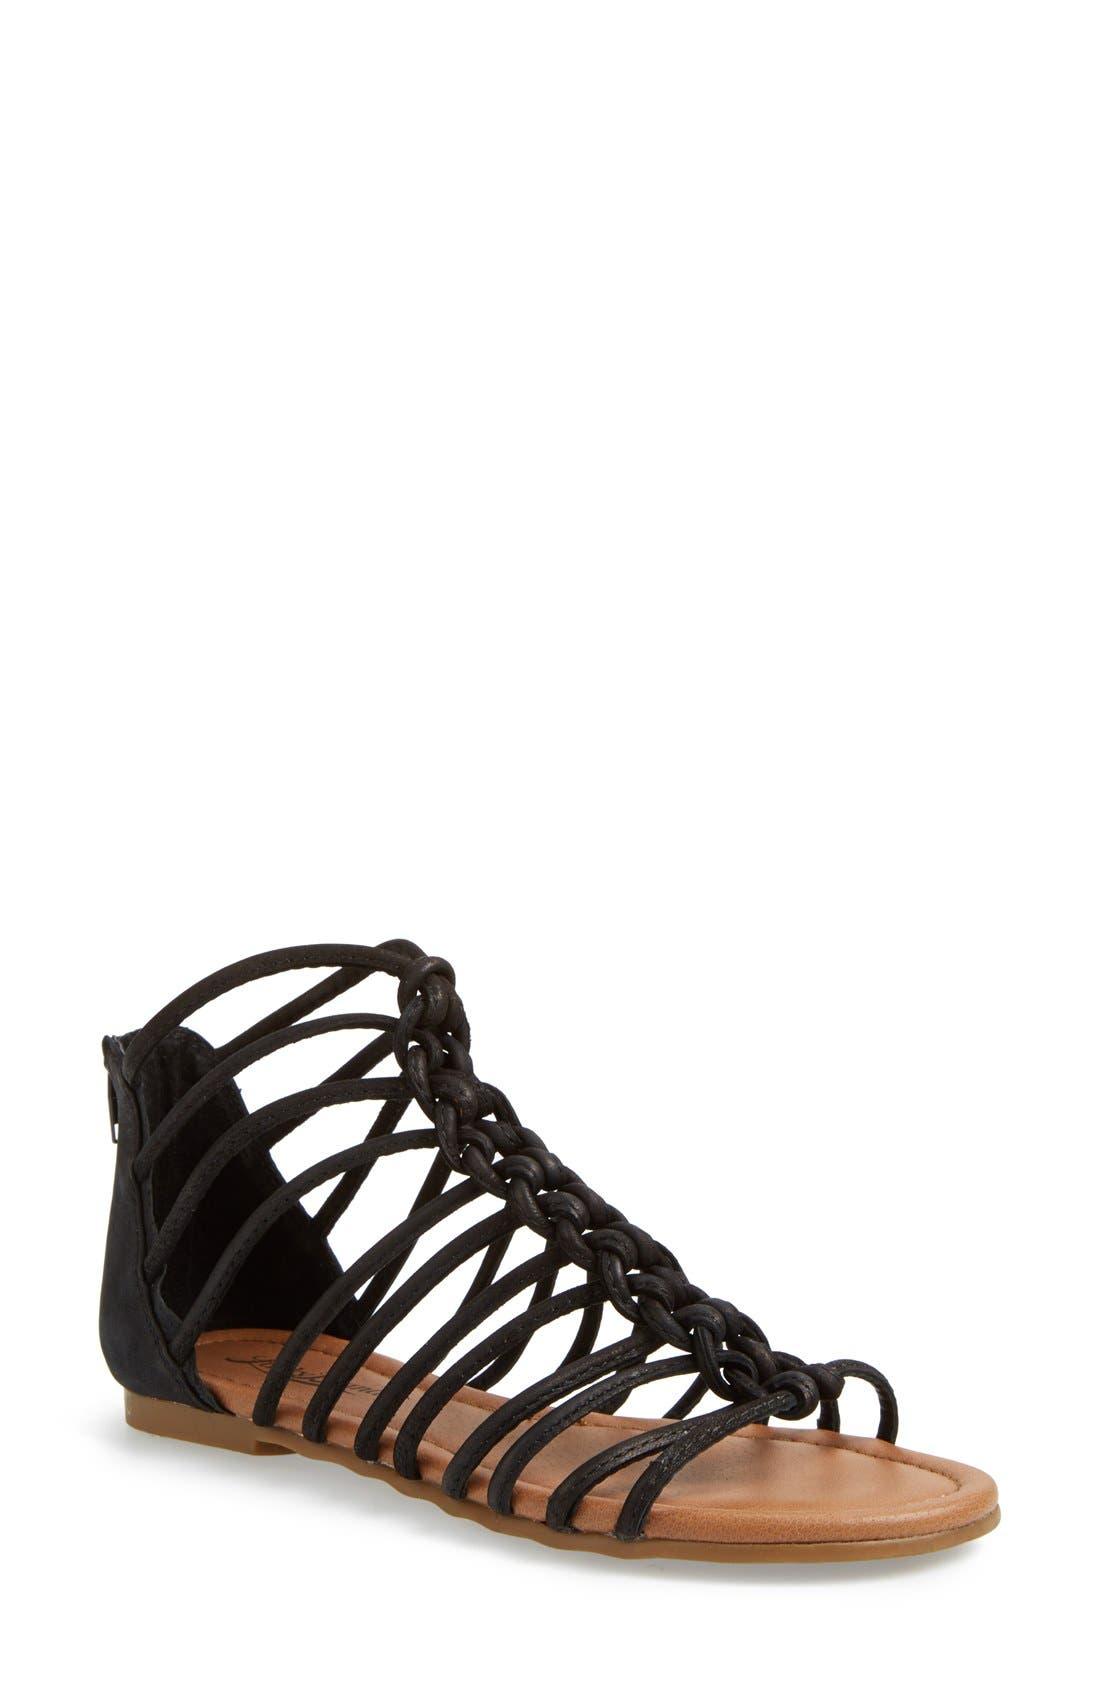 Main Image - Lucky Brand 'Casmett' Leather Caged Sandal (Women)